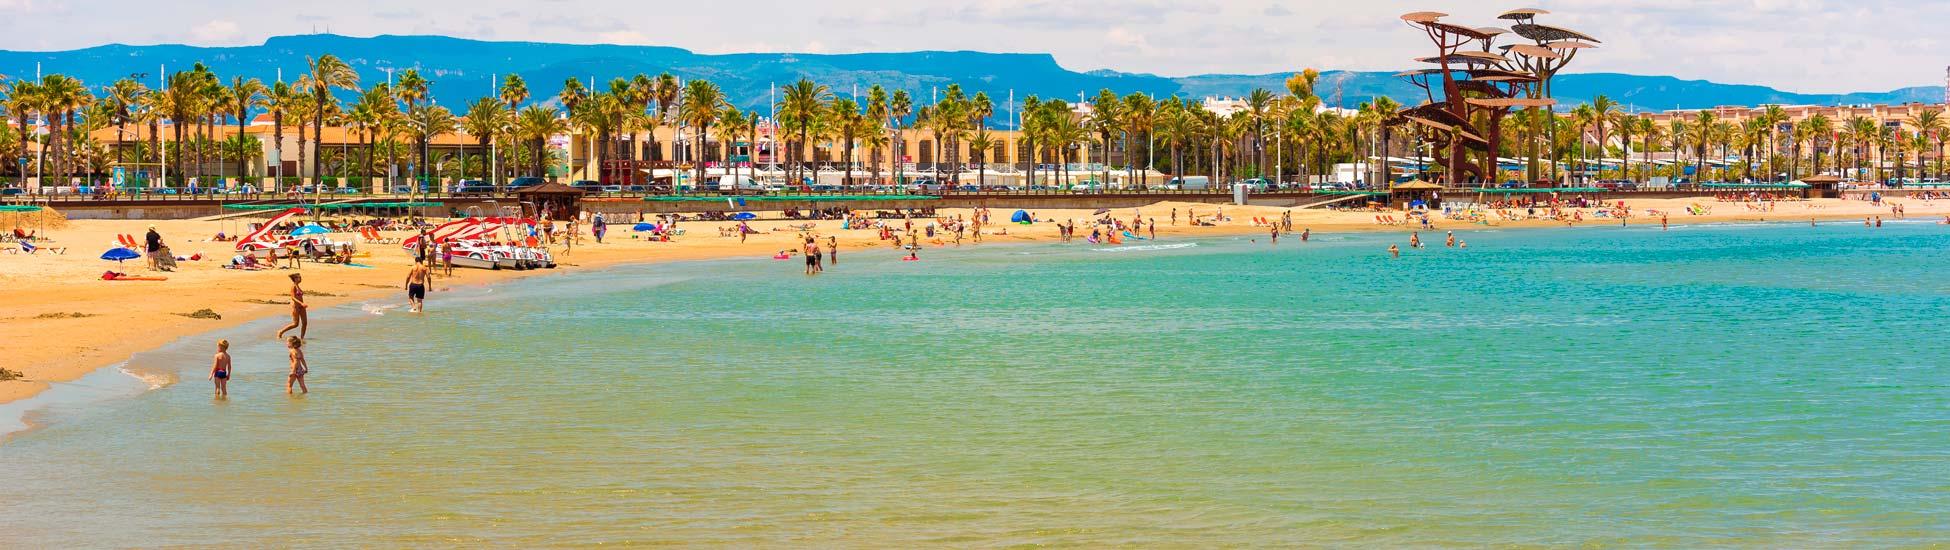 Location La Pineda Espagne